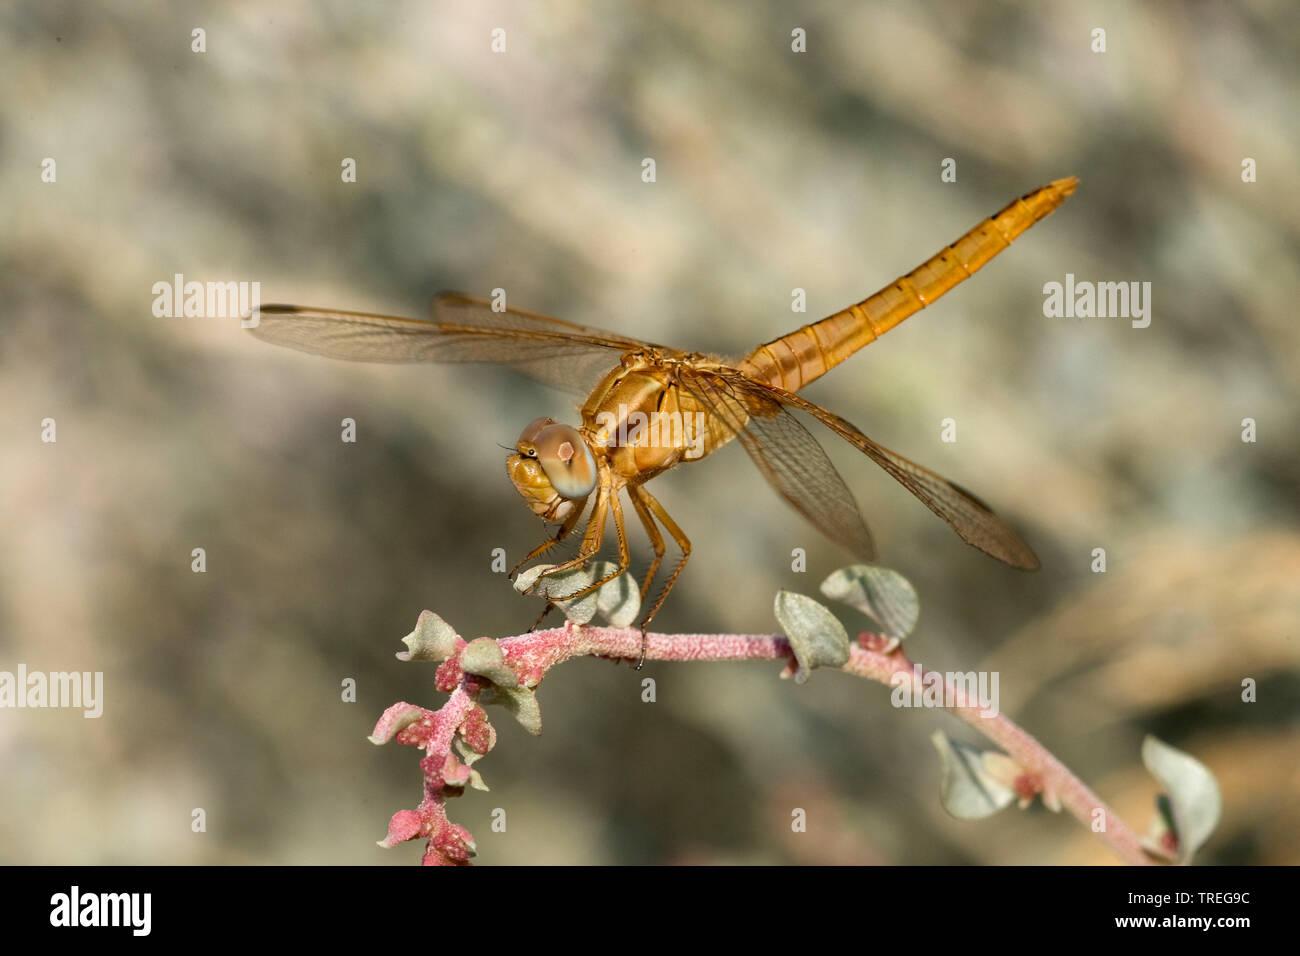 Broad Scarlet, Common Scarlet-darter, Scarlet Darter, Scarlet Dragonfly (Crocothemis erythraea, Croccothemis erythraea), female on a stem, Spain Stock Photo